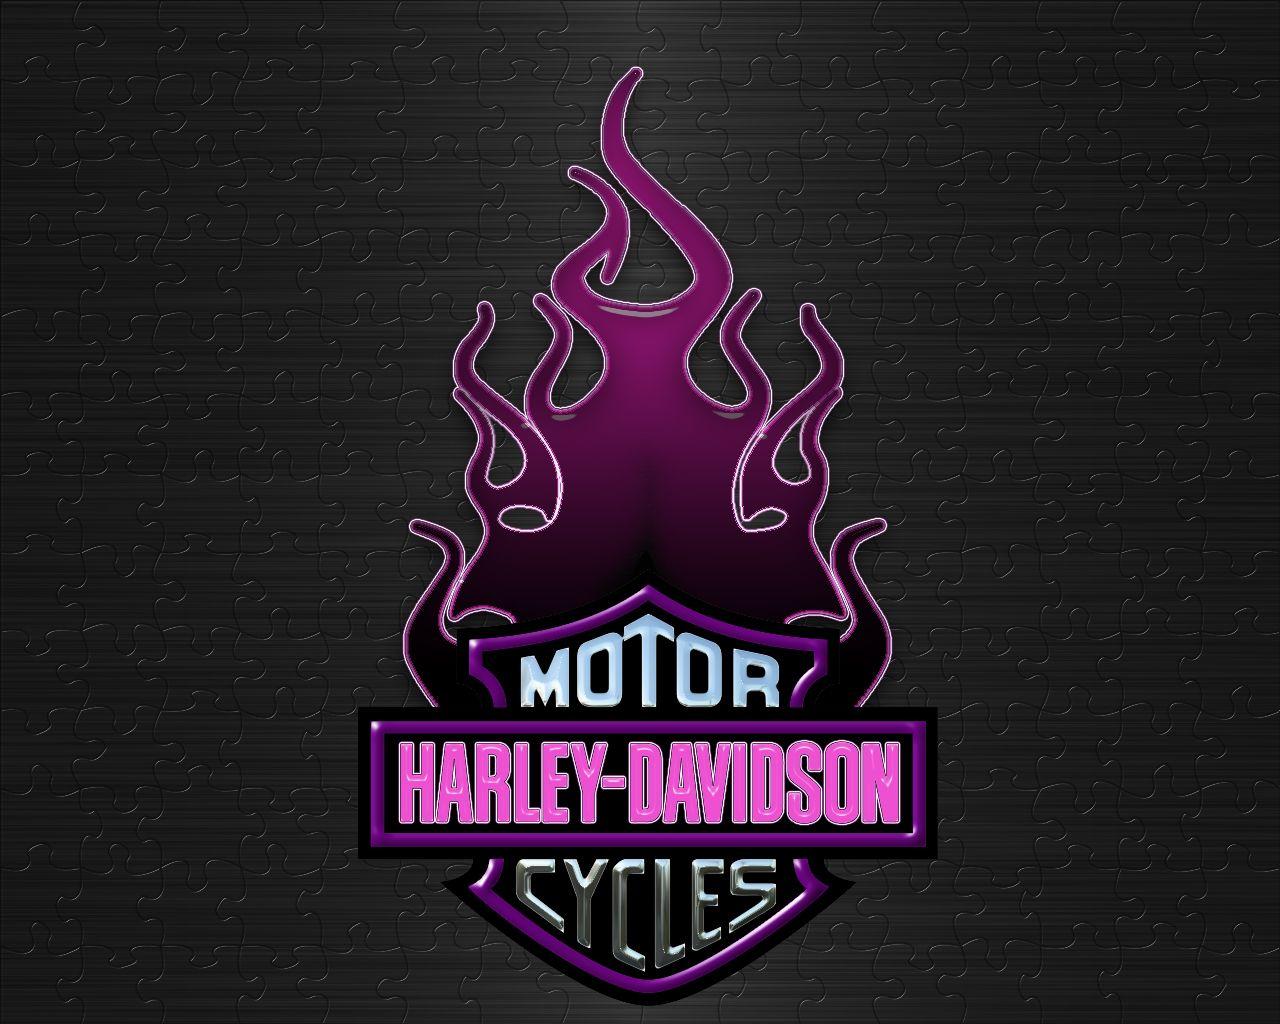 Harley davidson wallpaper. Clip art by techoveride